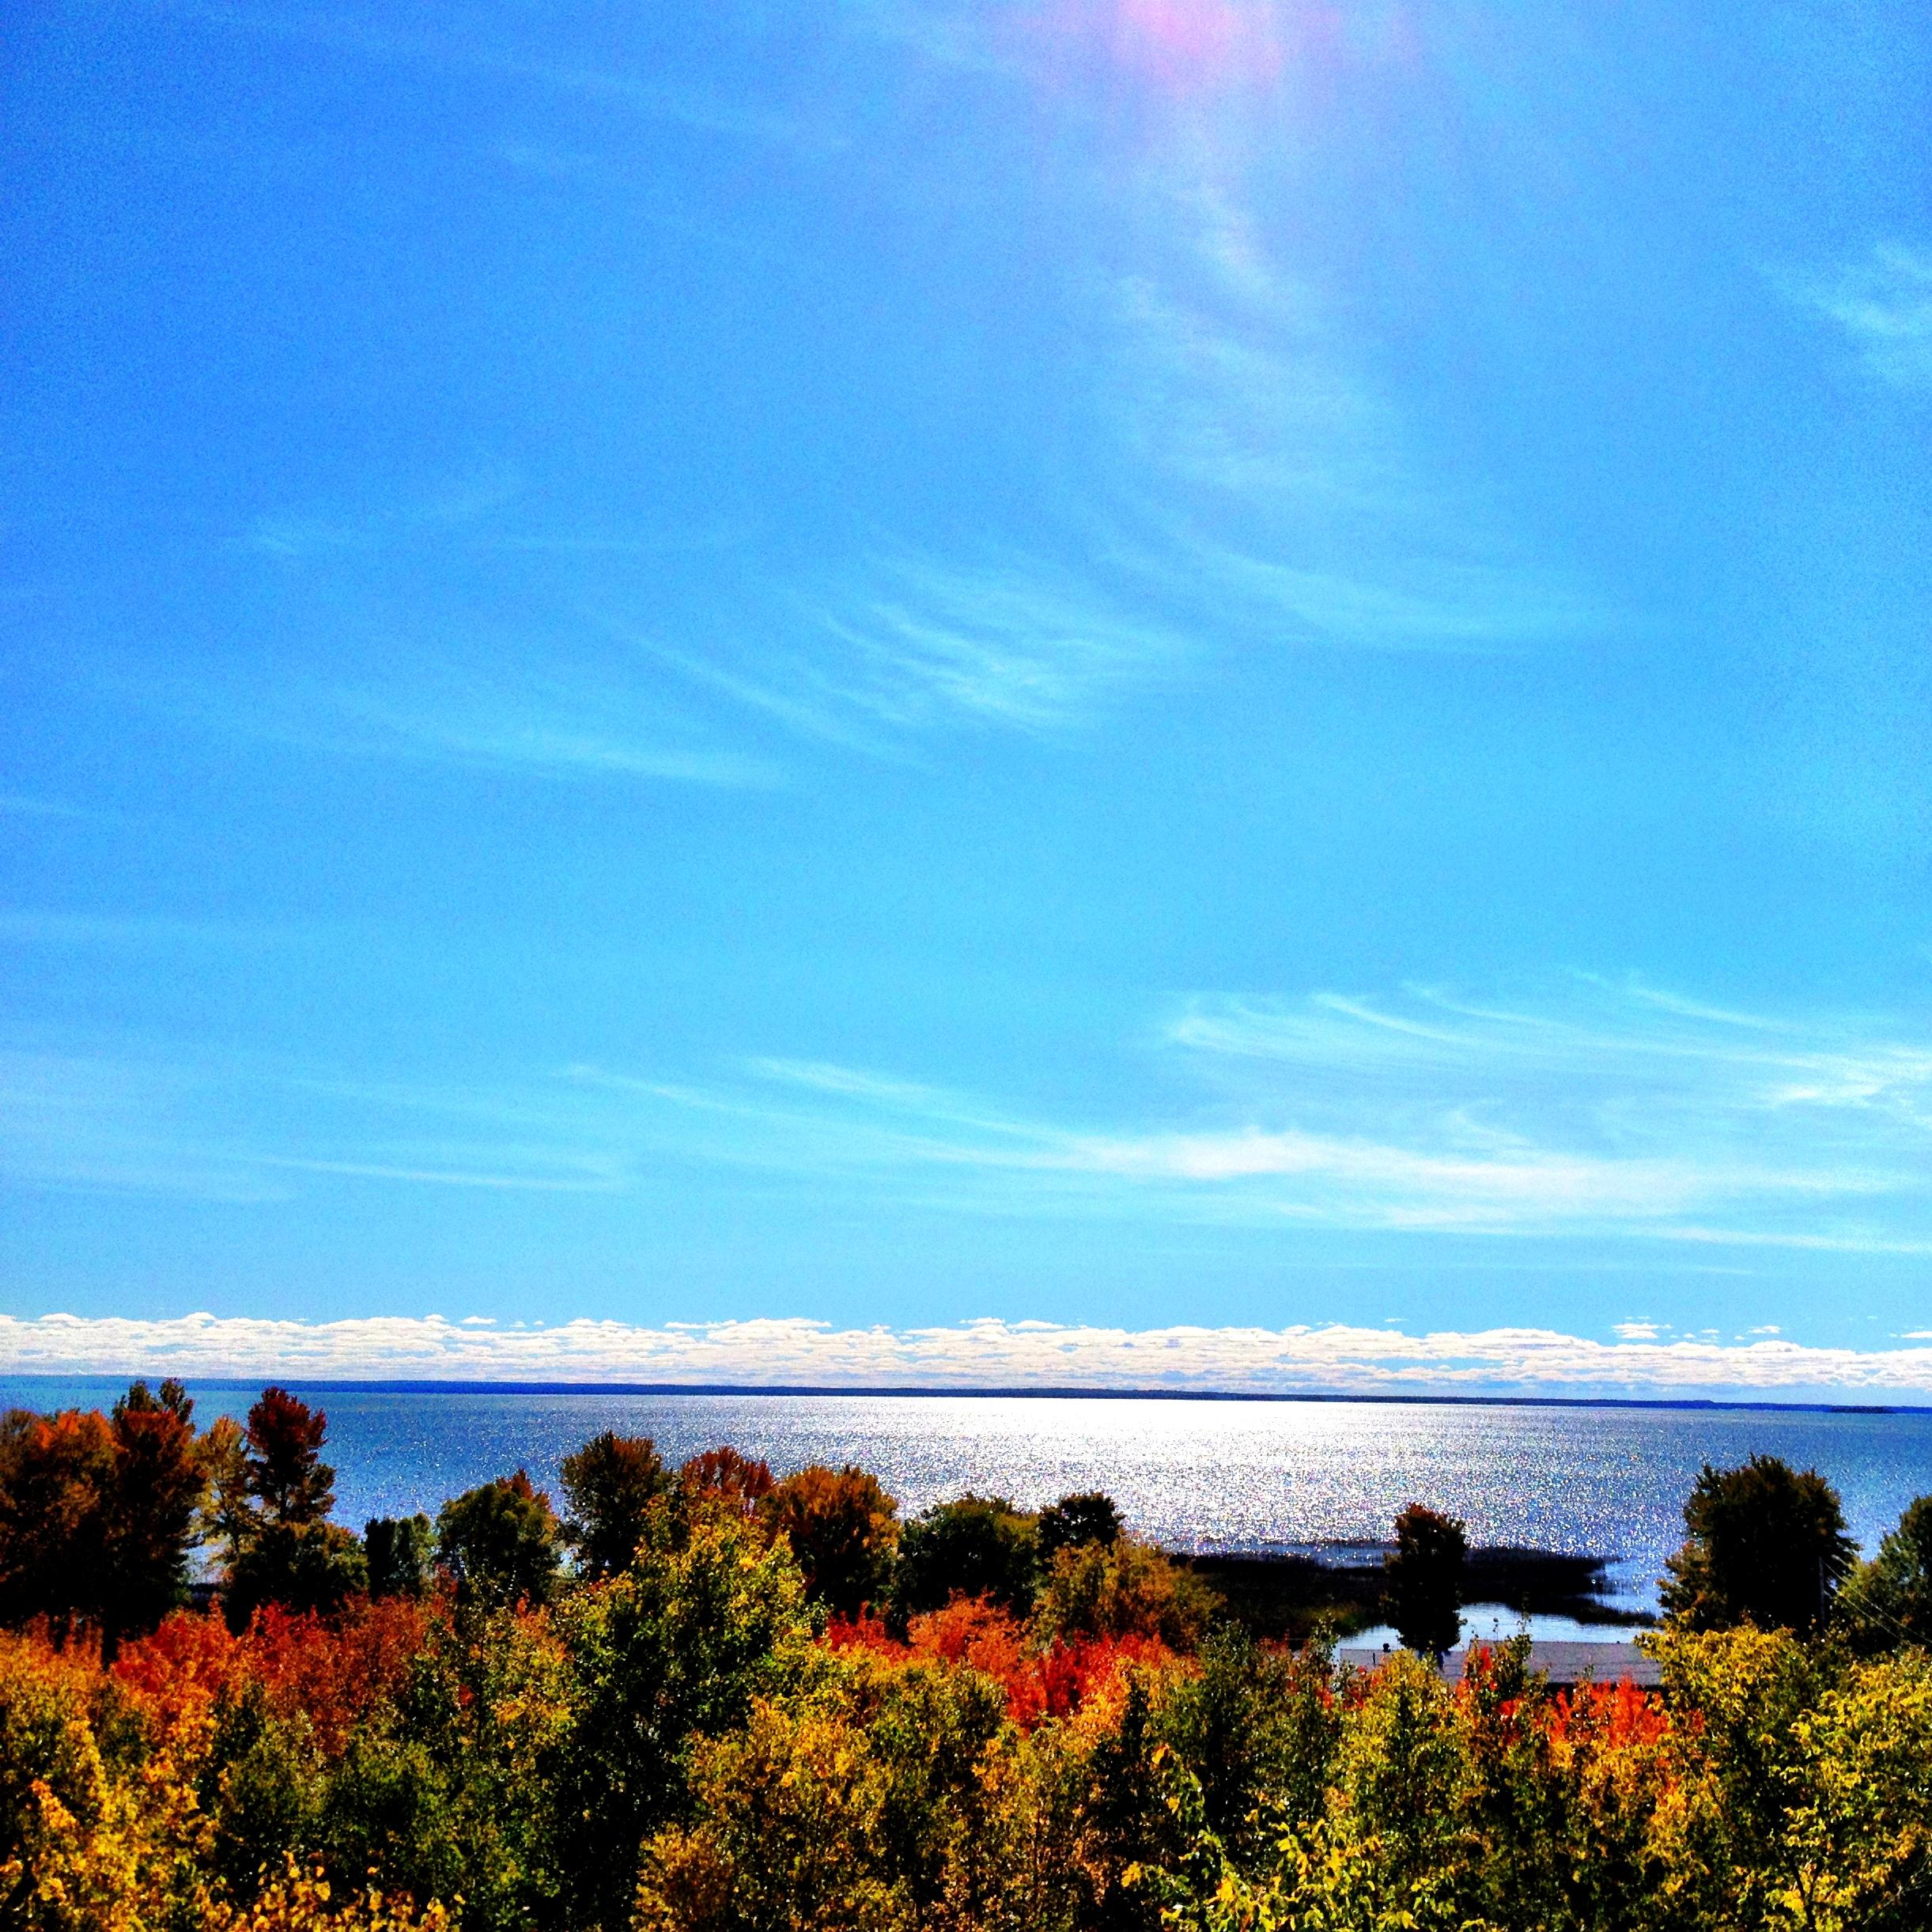 Northern Ontario.